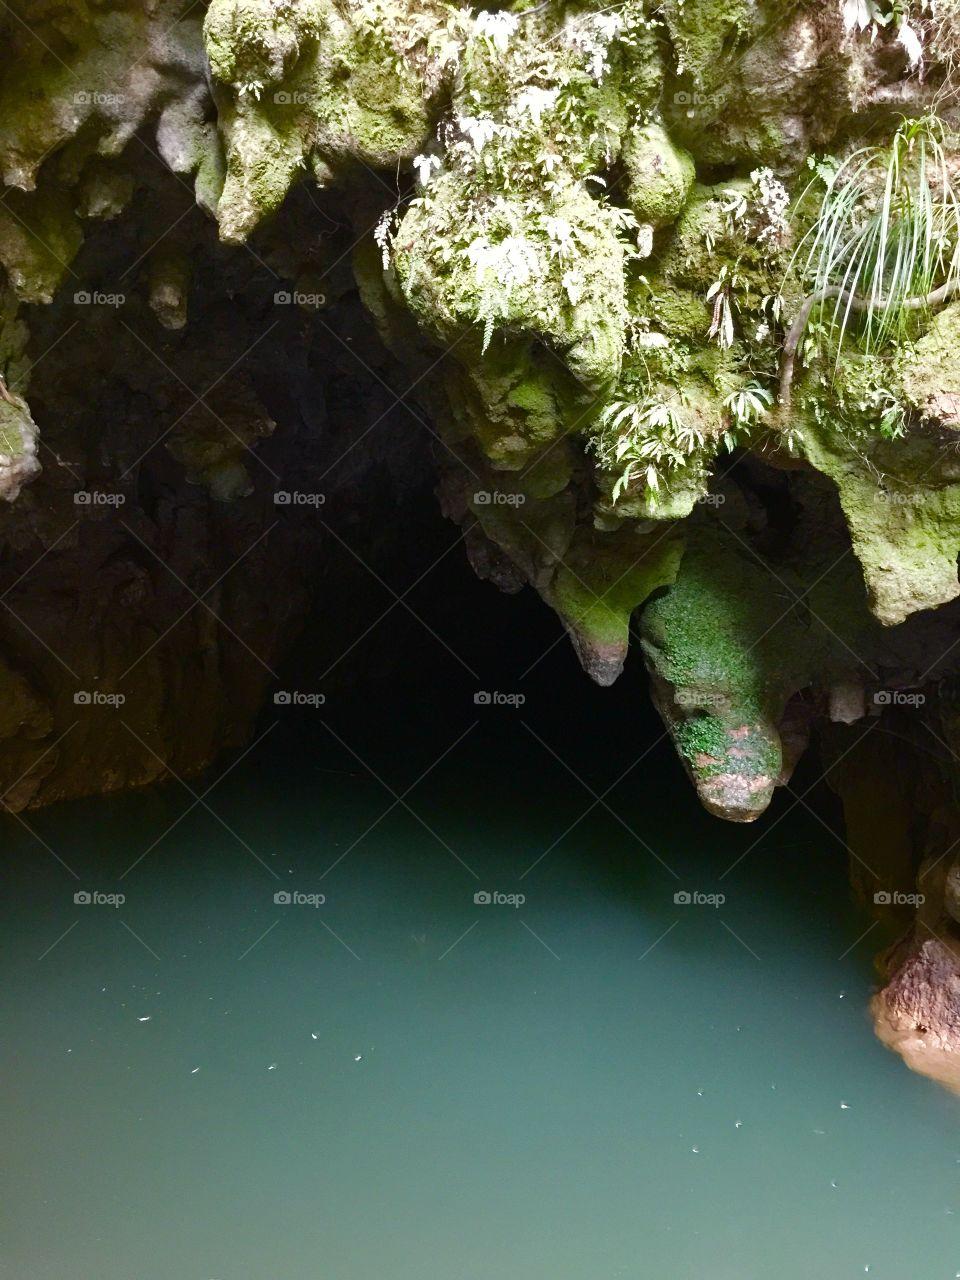 Underground river cave